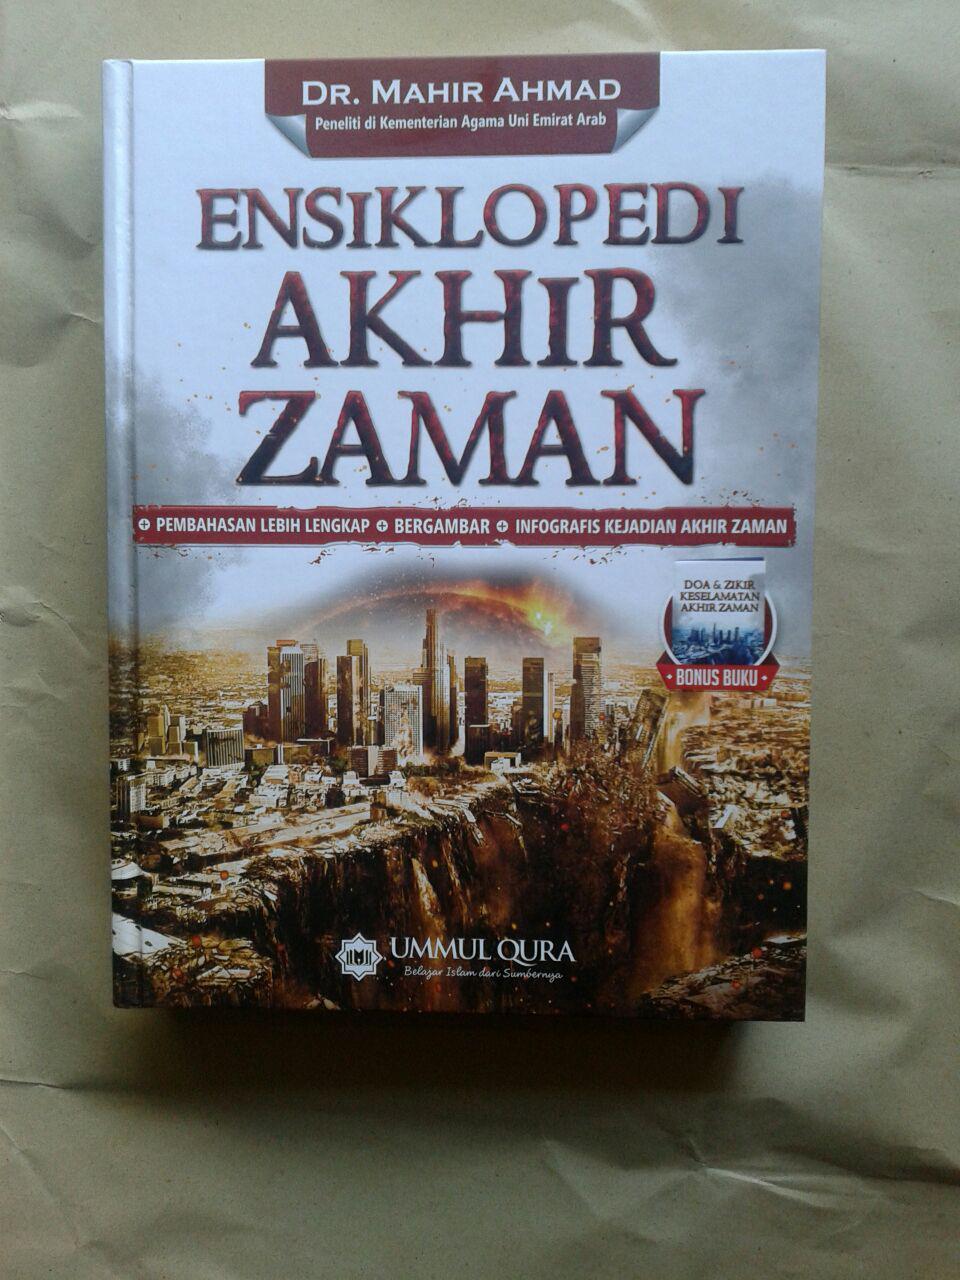 Buku Ensiklopedi Akhir Zaman 199.000 20% 159.200 Ummul Qura cover